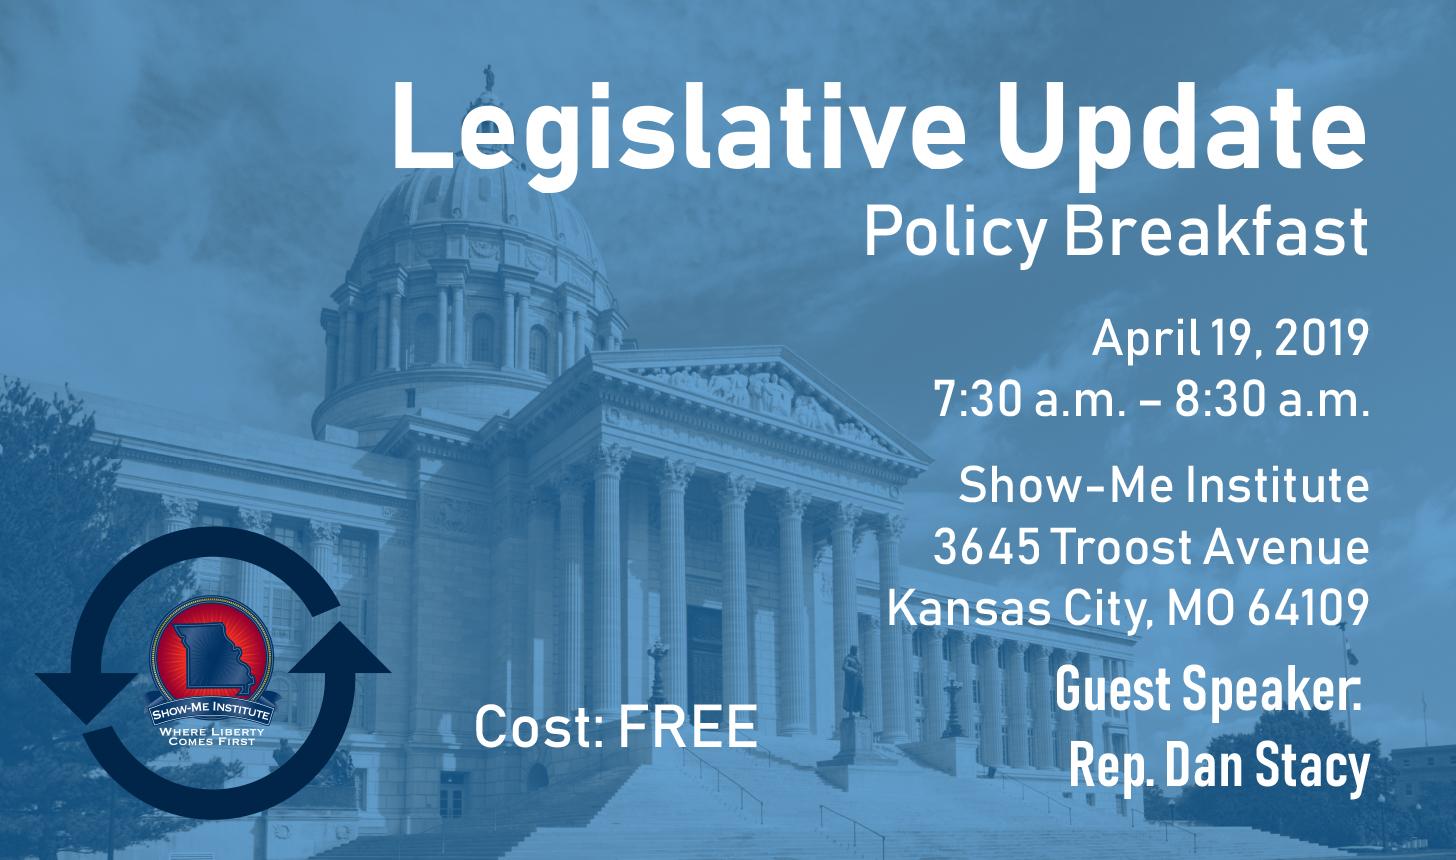 Legislative Update - Kansas City Policy Breakfast